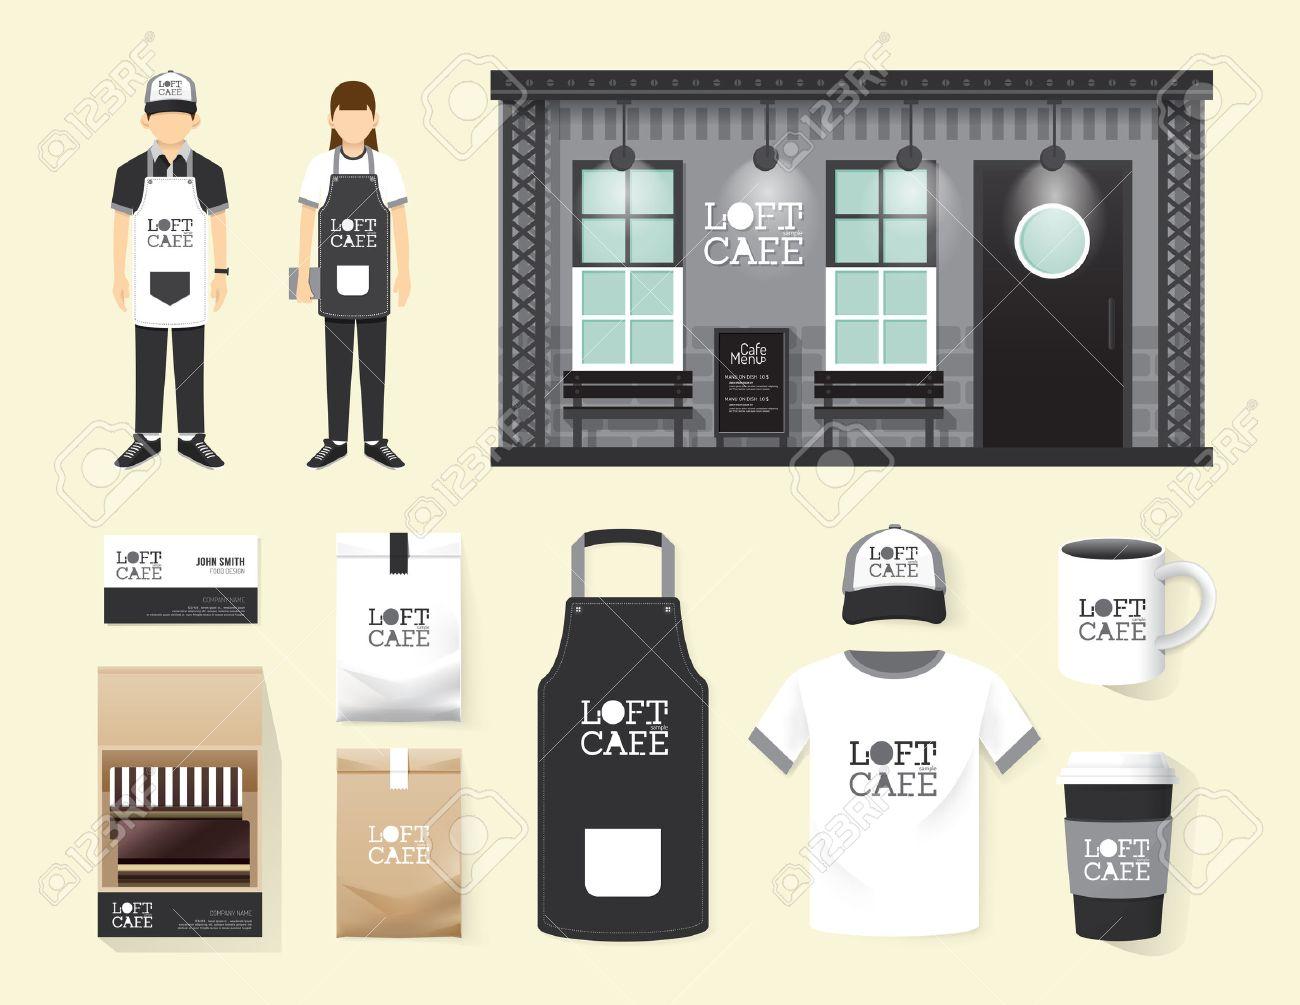 White apron mockup free - Apron Template Restaurant Cafe Set Shop Front Design Flyer Menu Package